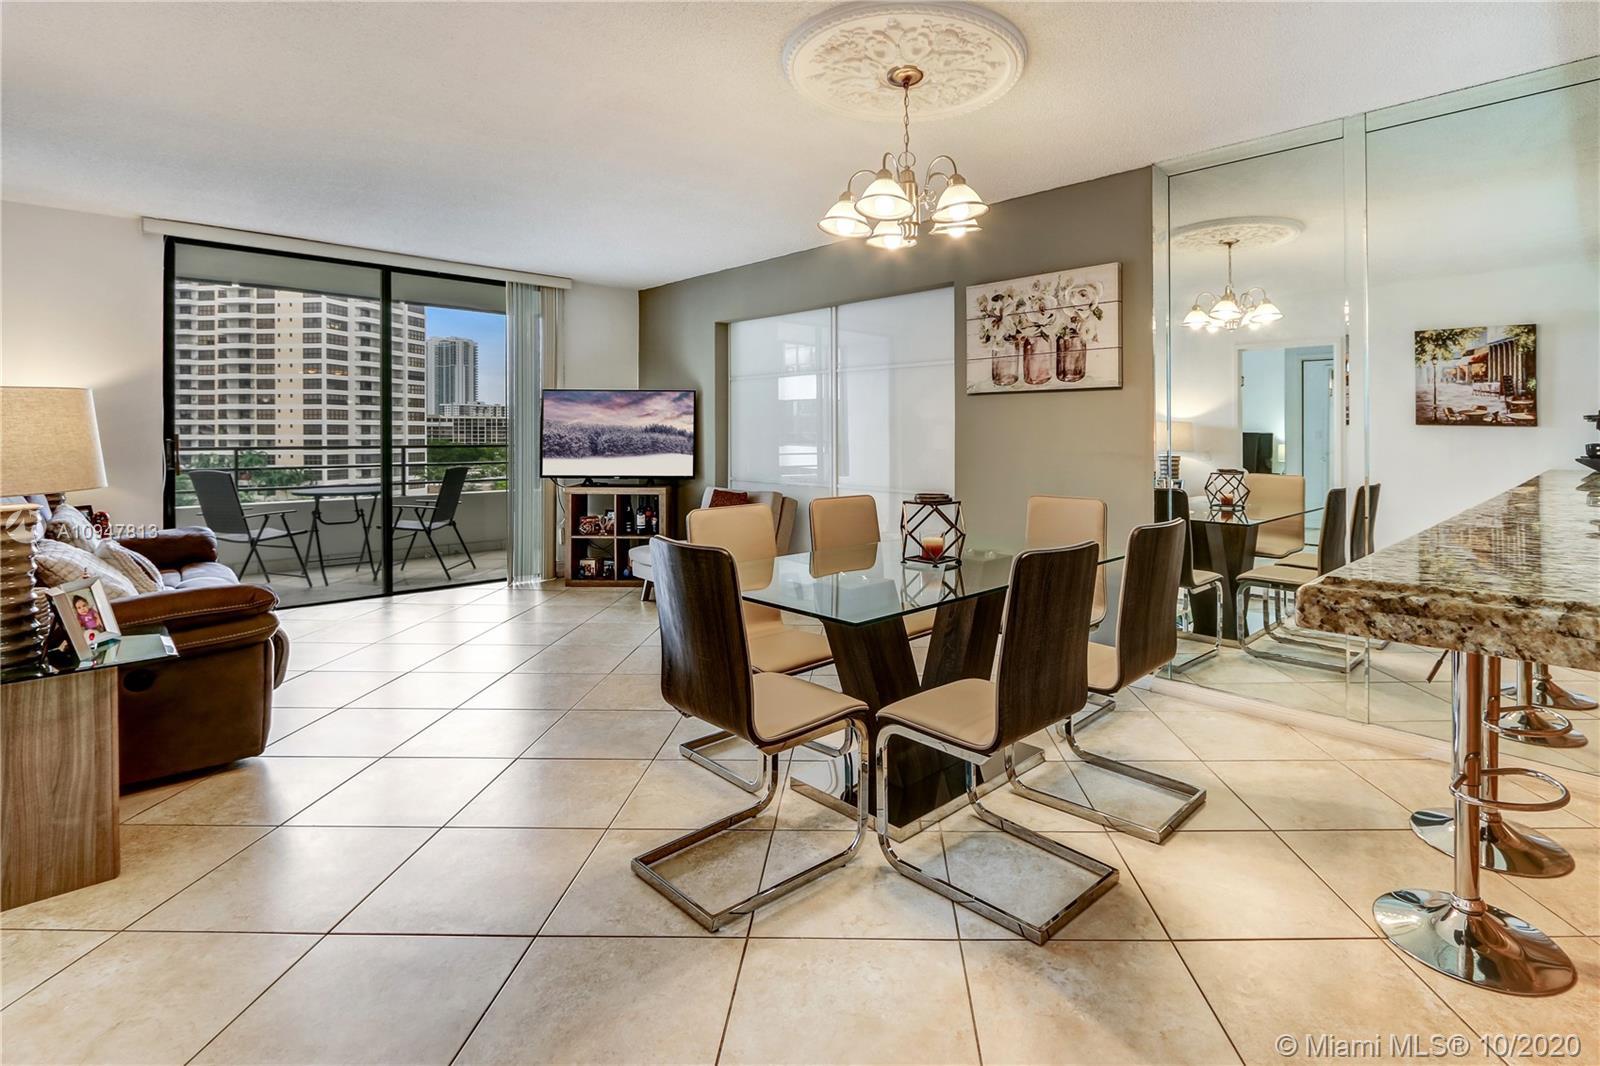 500 Three Islands Blvd # 421, Hallandale Beach, Florida 33009, 2 Bedrooms Bedrooms, ,2 BathroomsBathrooms,Residential,For Sale,500 Three Islands Blvd # 421,A10947813